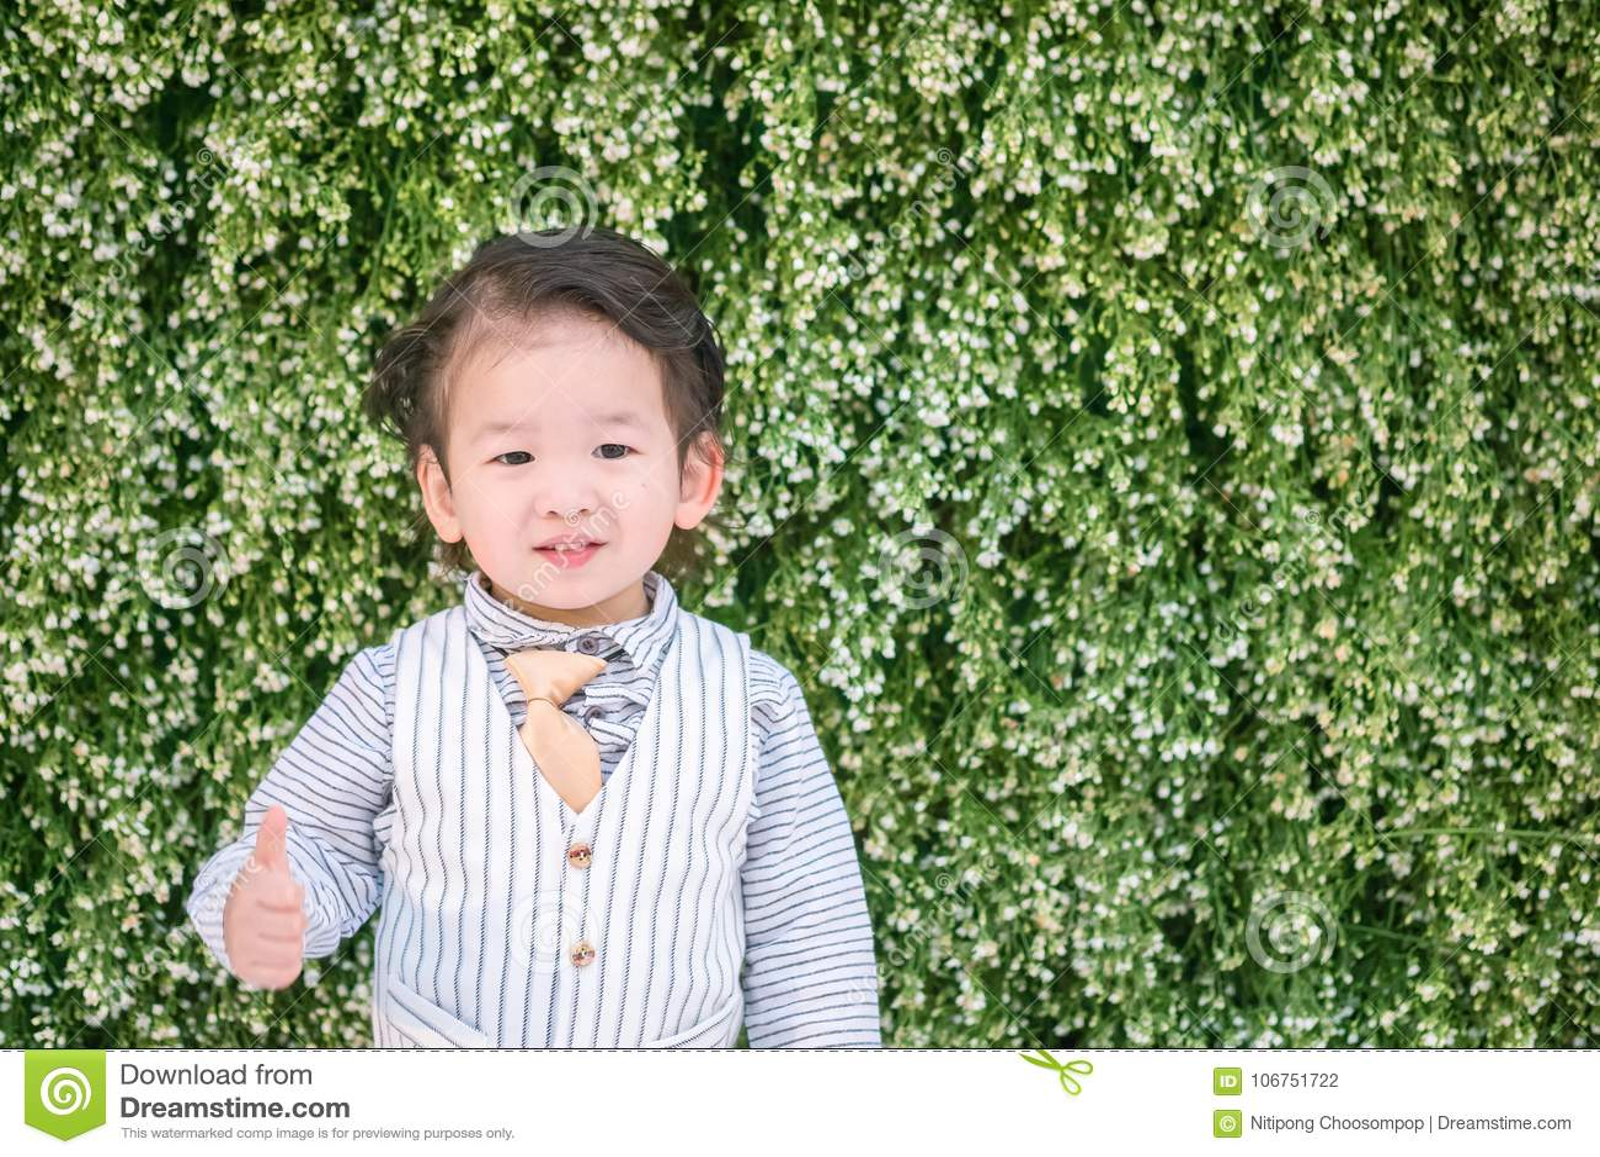 A plant that makes children happy 58